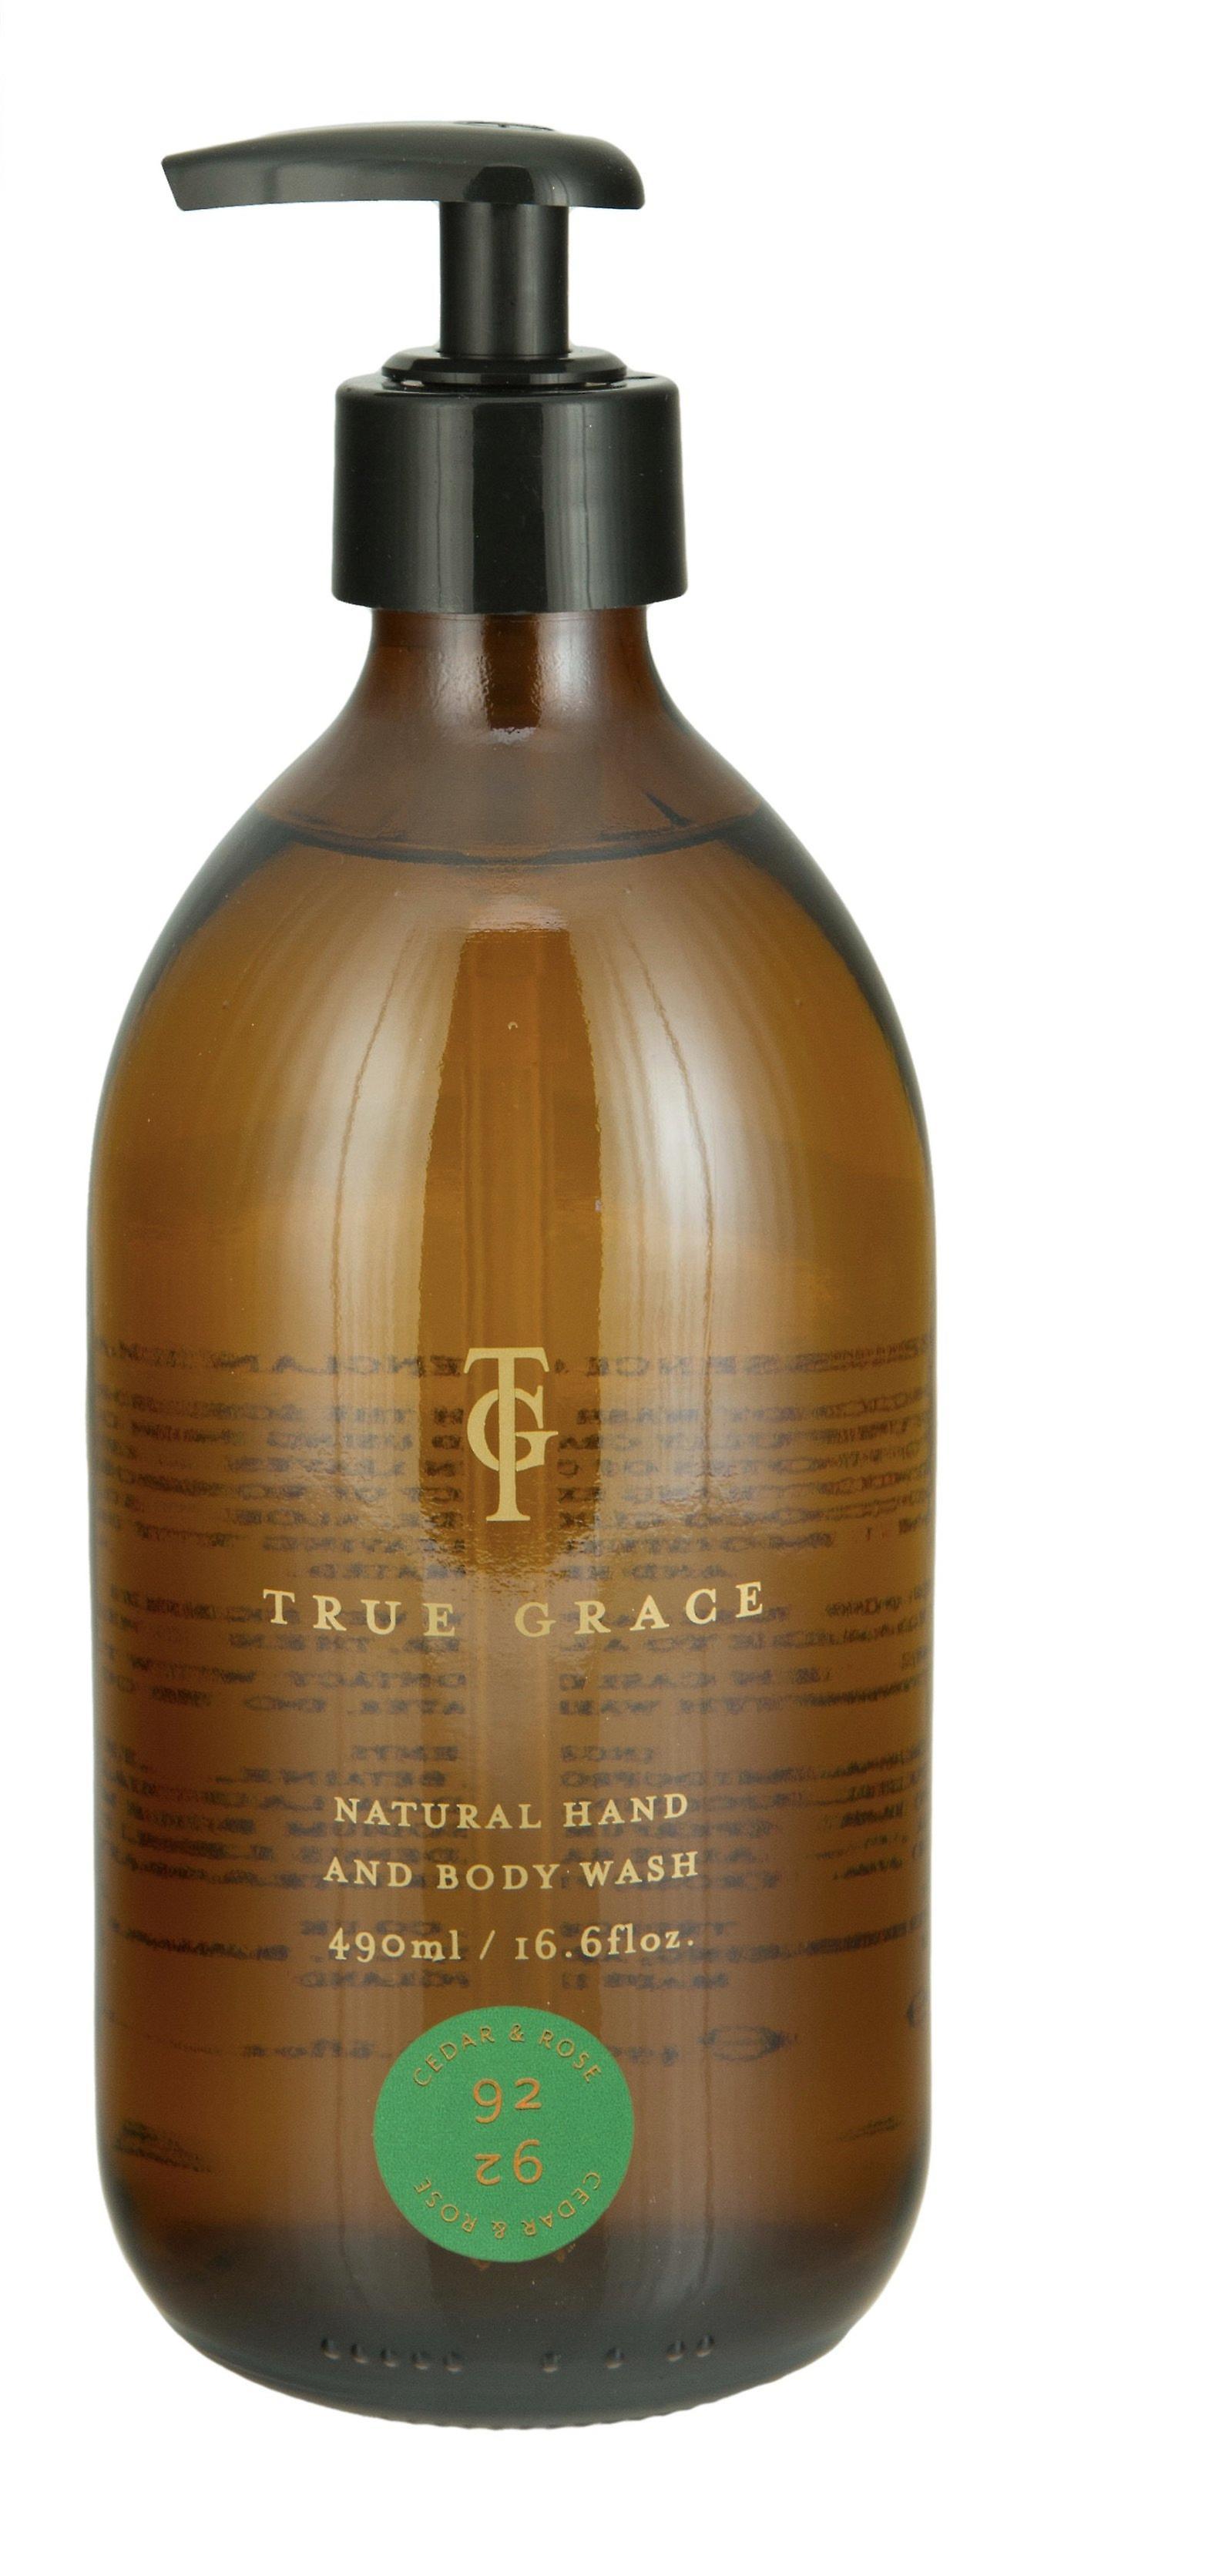 Burlington cedar and rose - natural shower gel and hand soap, 490ml